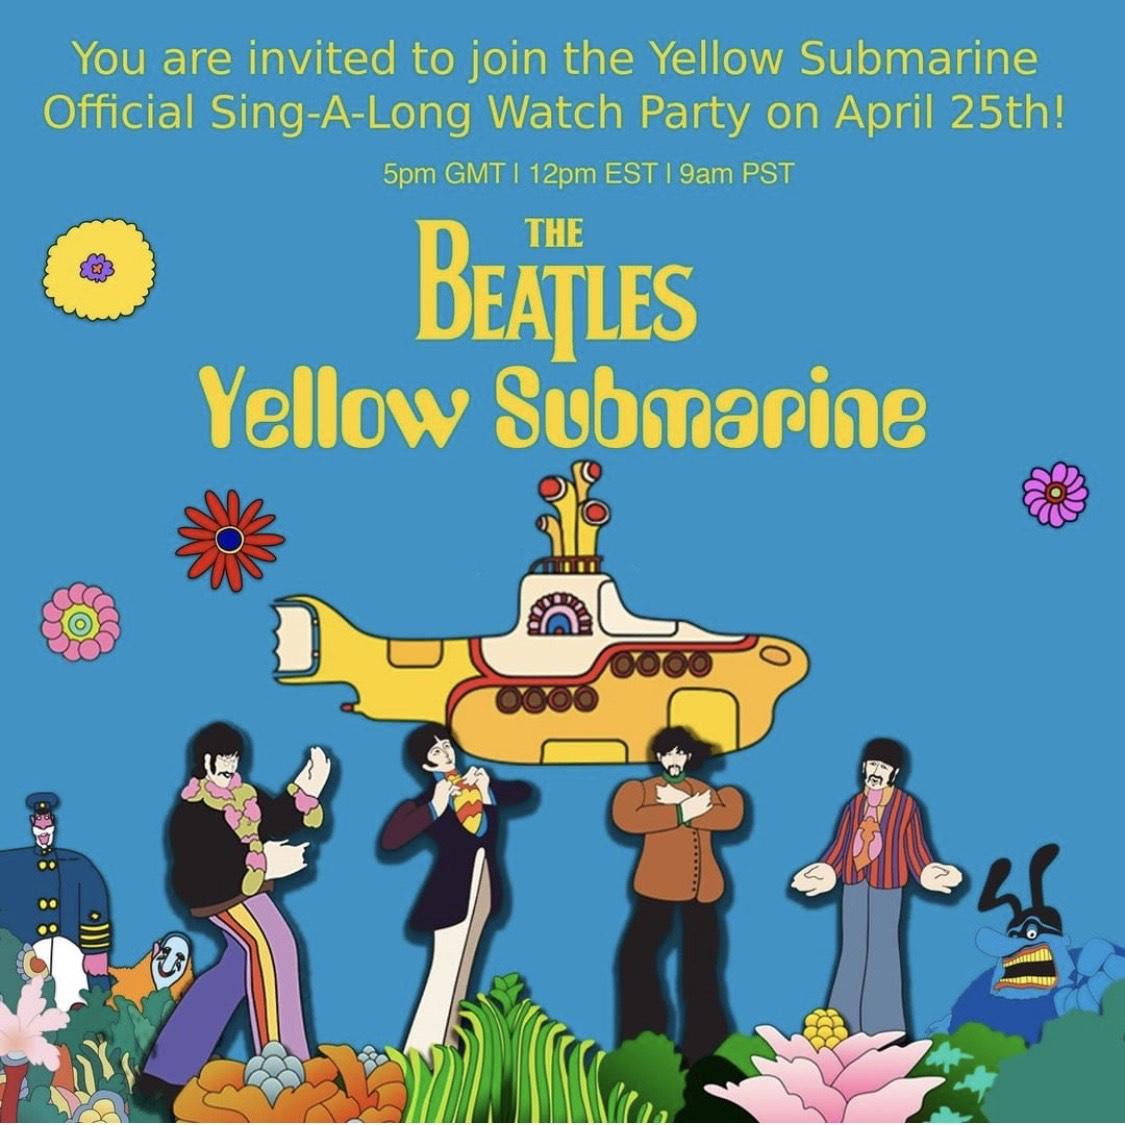 THE BEATLES YELLOW SUBMARINE SING-A-LONG PARTY / HOY SÁBADO 25.04 / 18h